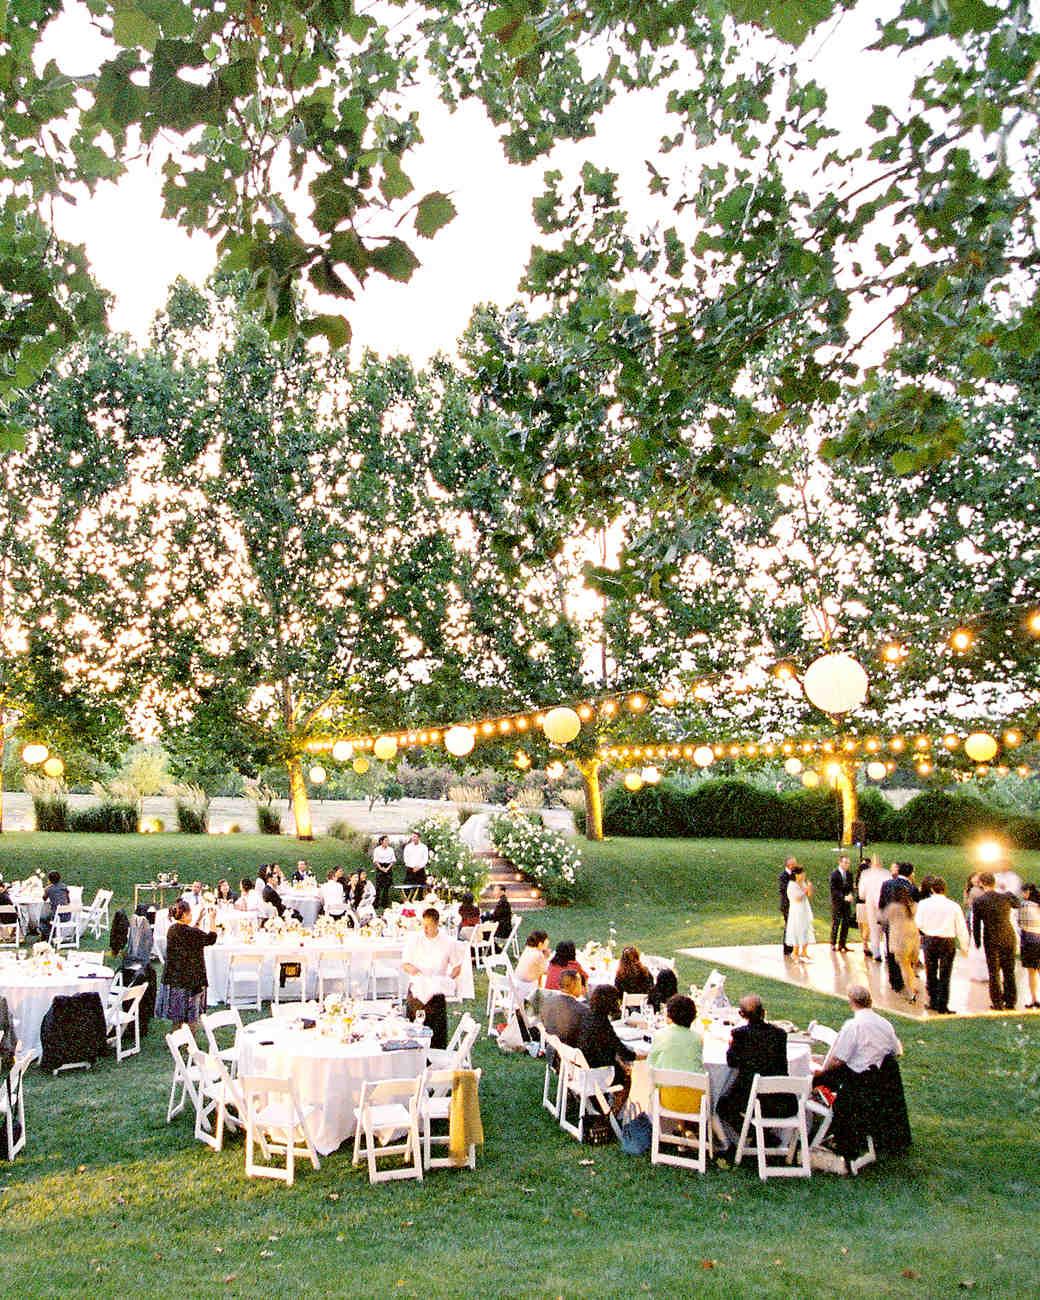 Backyard Wedding Ideas For Summer Outdoor Wedding Ideas For Summer On A  Budget Outdoor Wedding Lighting